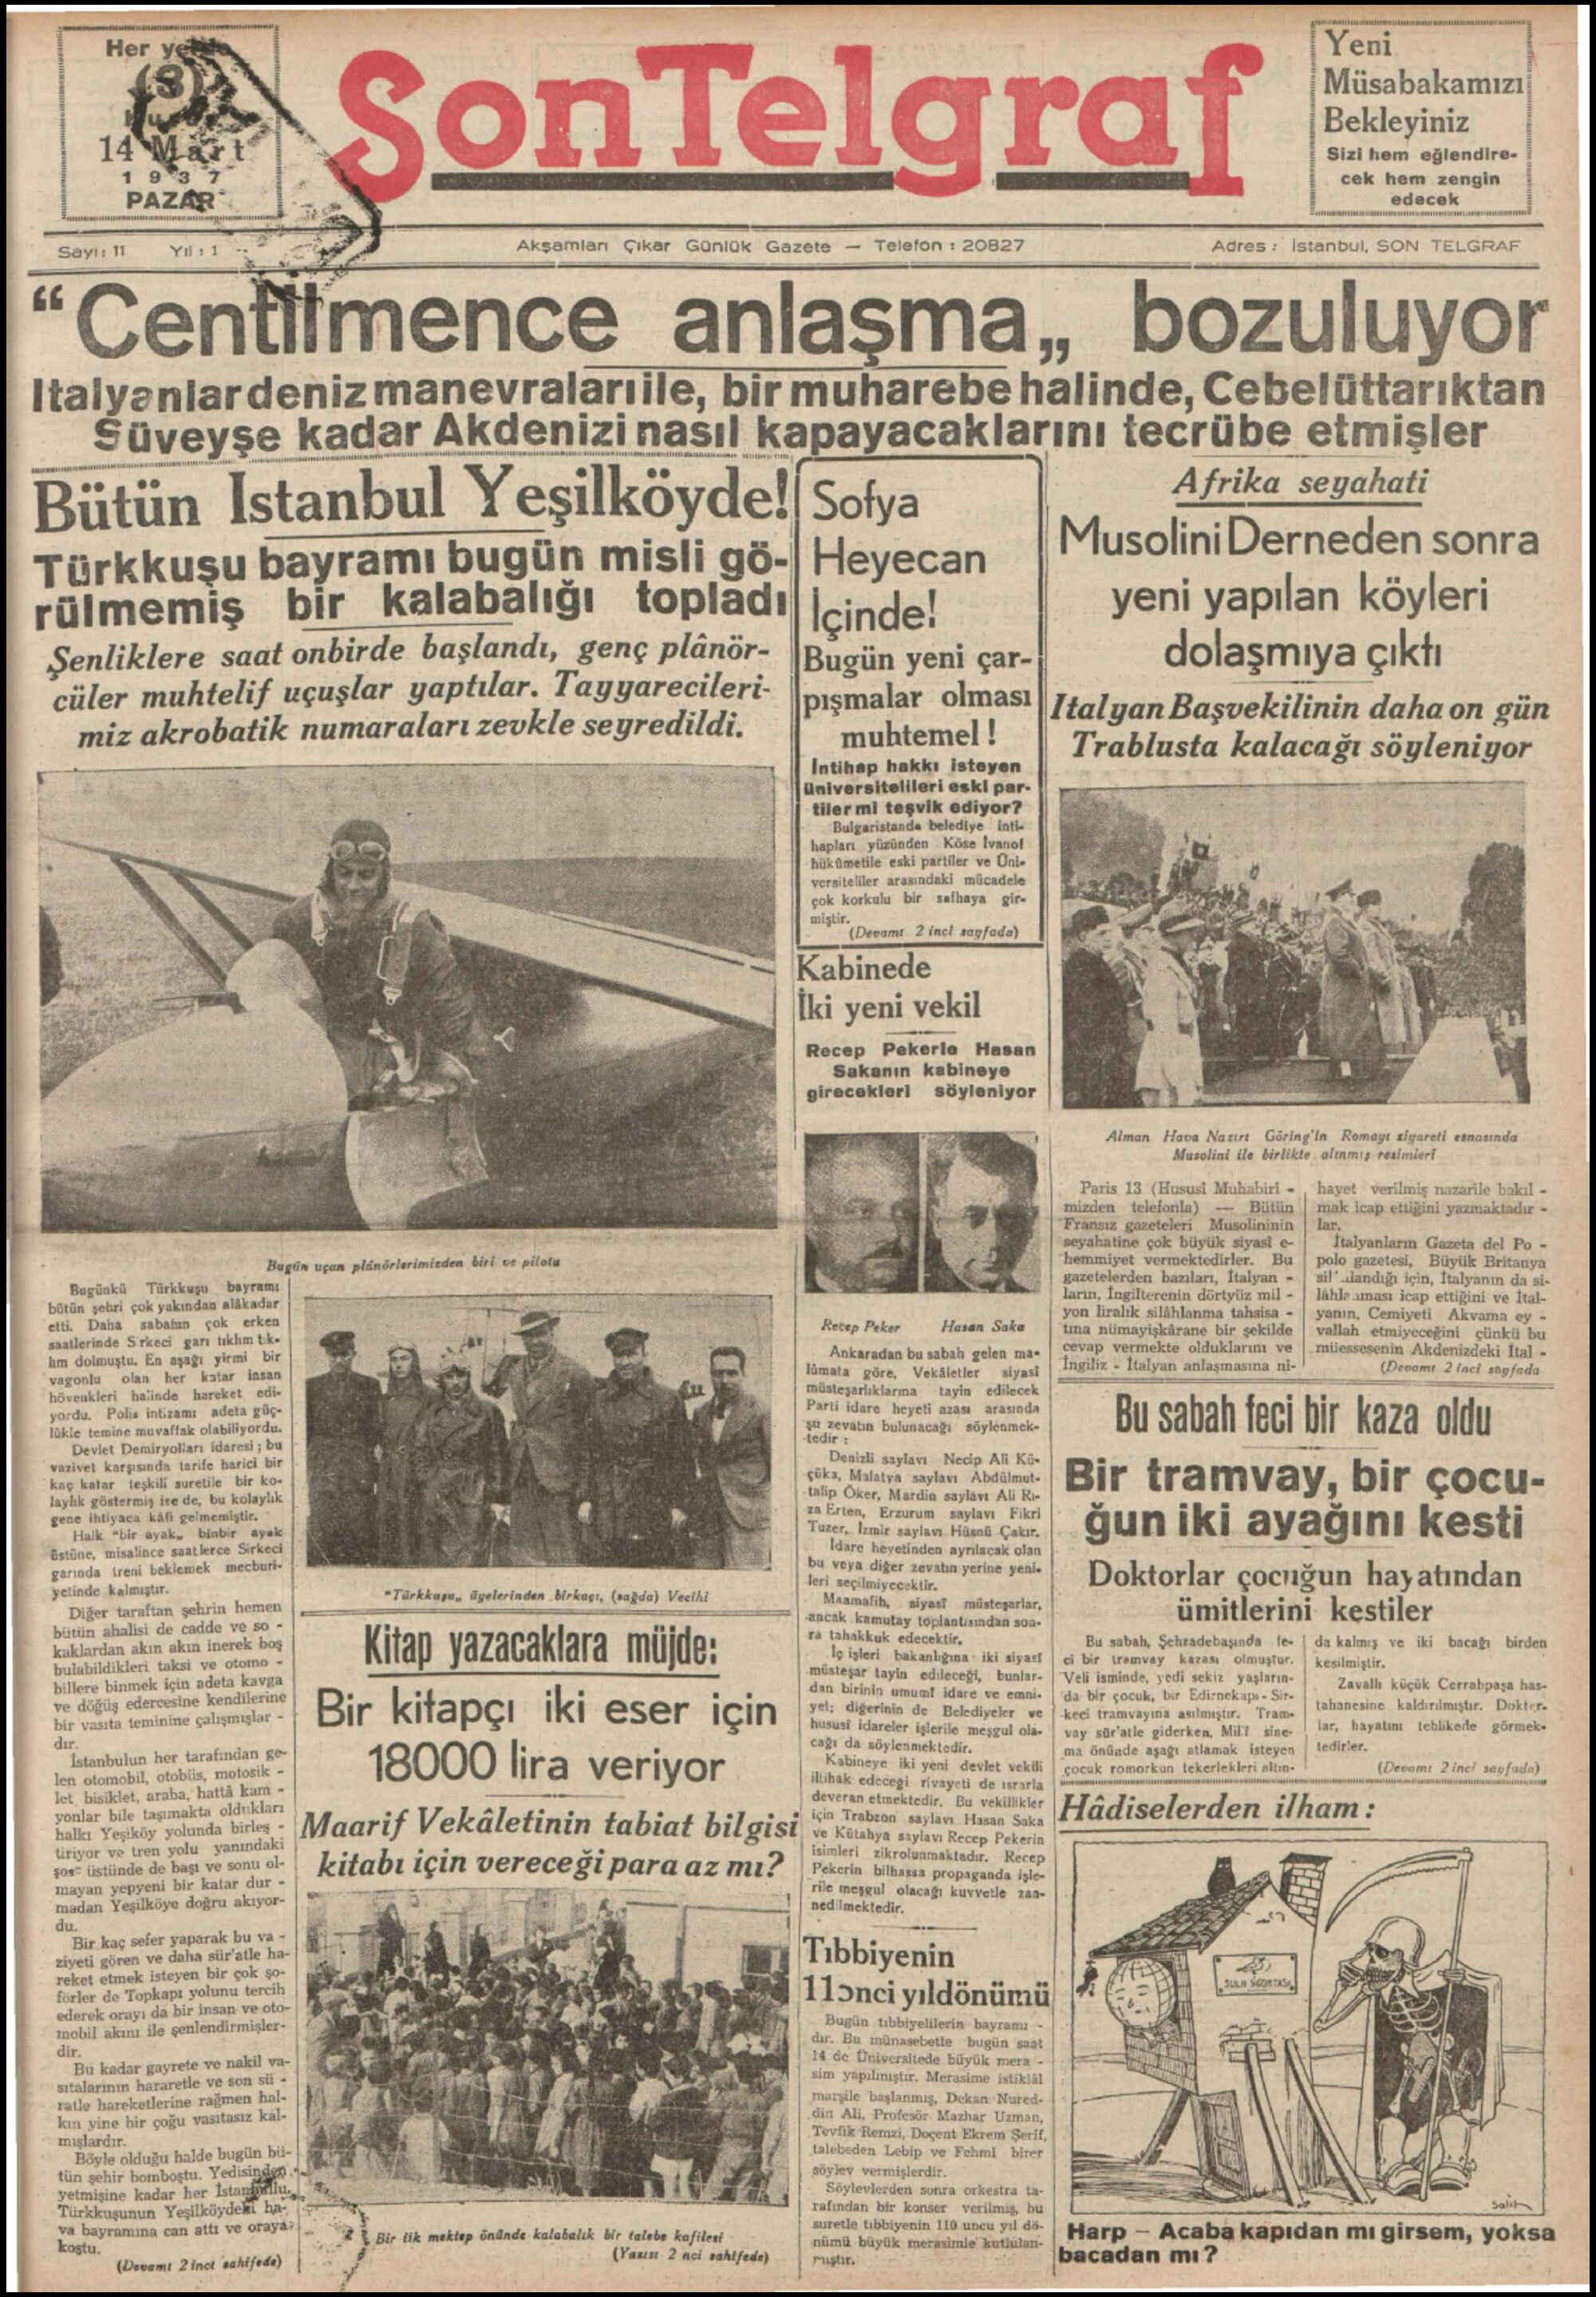 14 Mart 1937 Tarihli Son Telgraf Gazetesi Sayfa 1